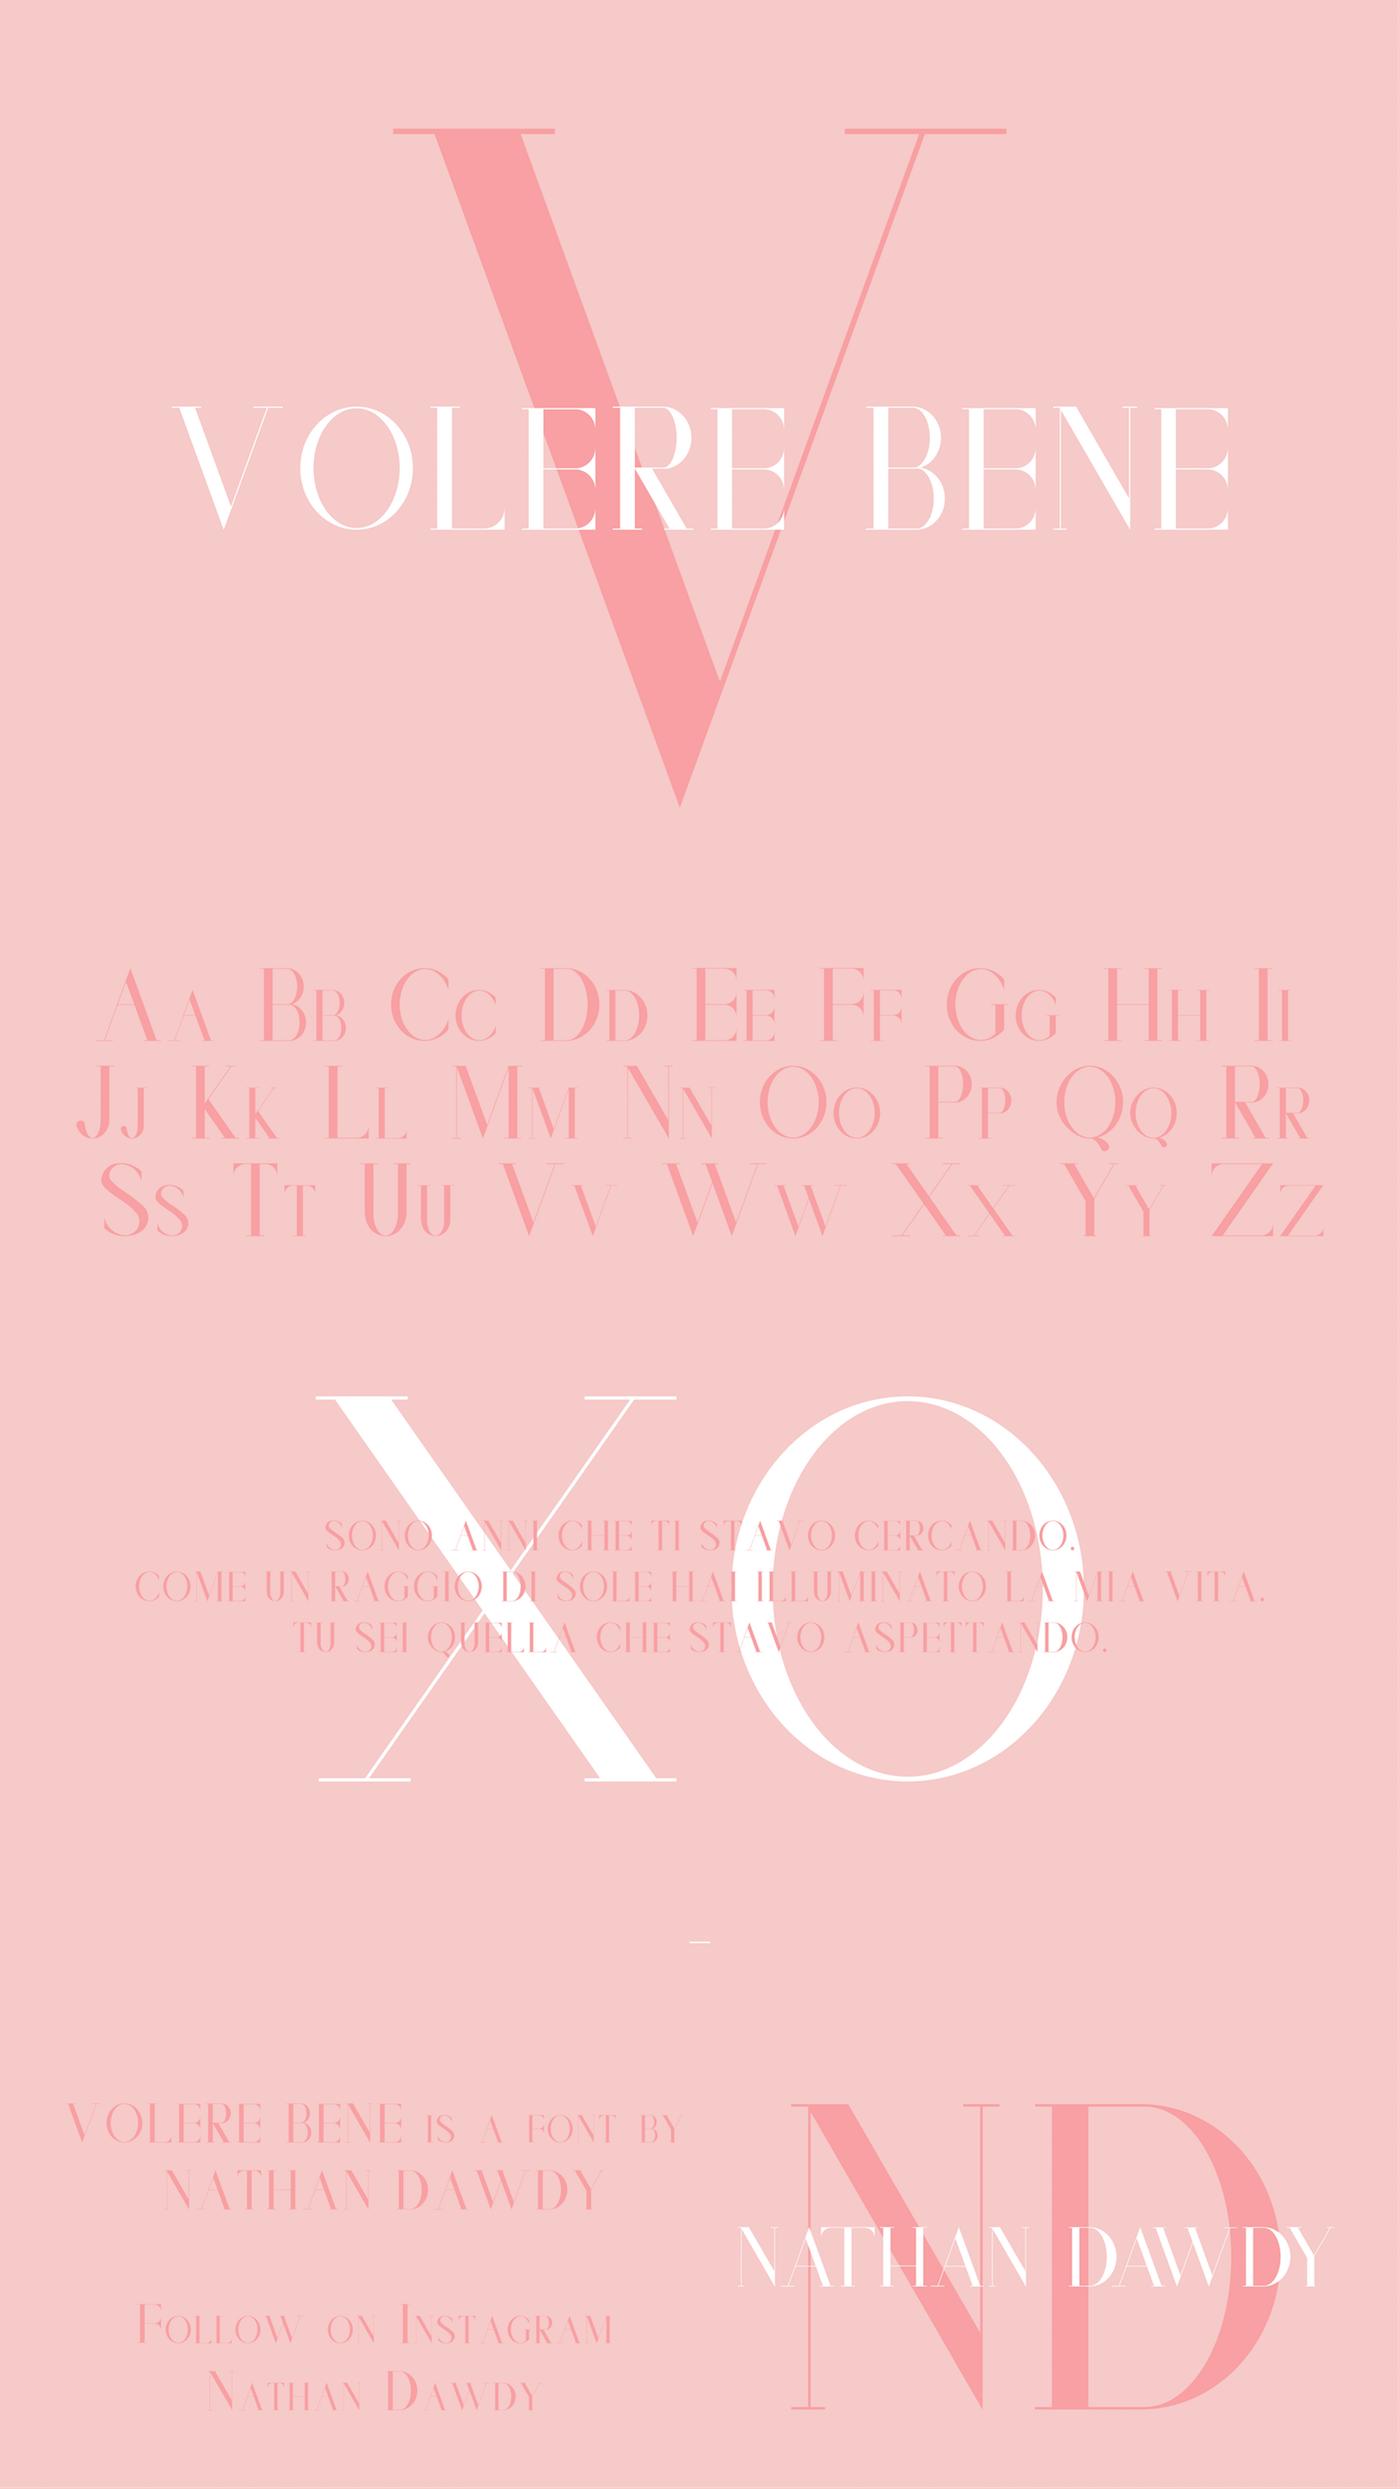 Volere Bene | Serif Display Typeface